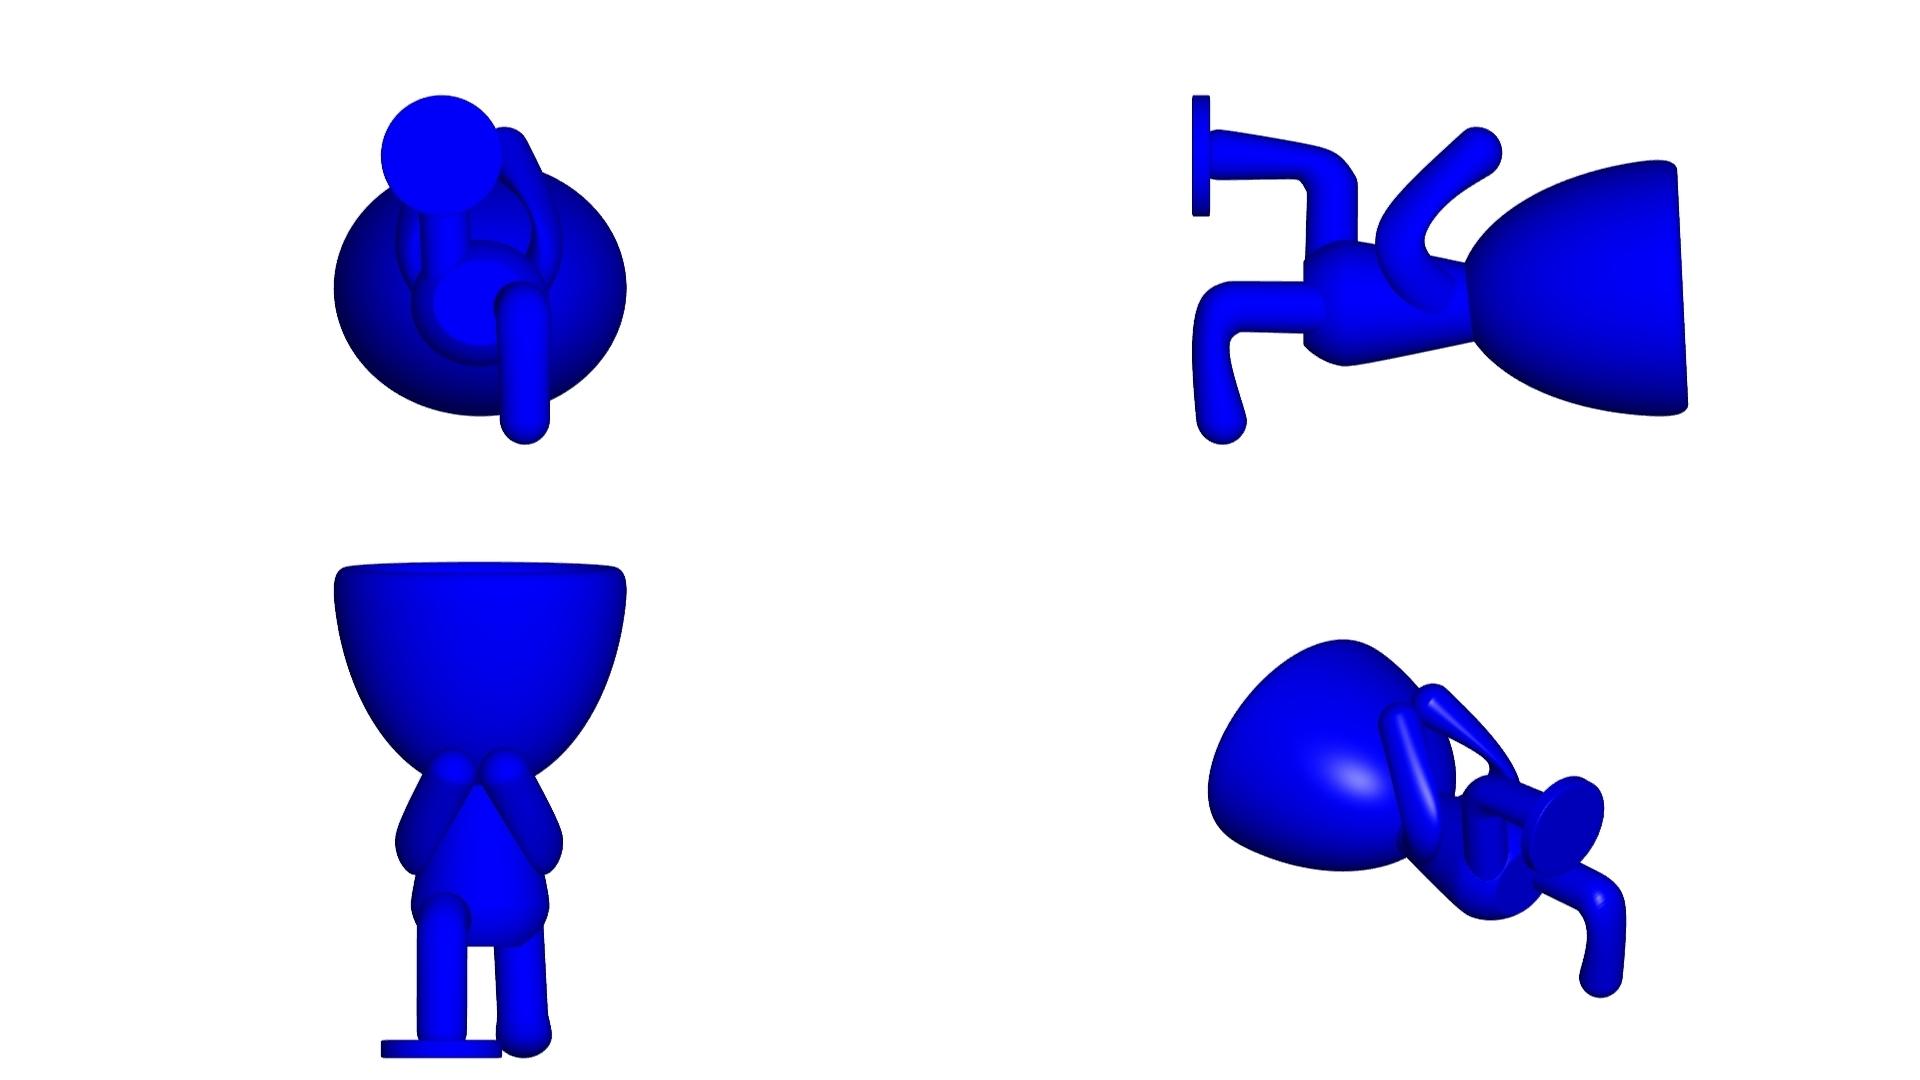 Vaso_08_Azul_2.jpg Télécharger fichier STL gratuit JARRÓN MACETA ROBERT 08 - VASE POT DE FLEURS ROBERT 08 • Modèle à imprimer en 3D, CREATIONSISHI